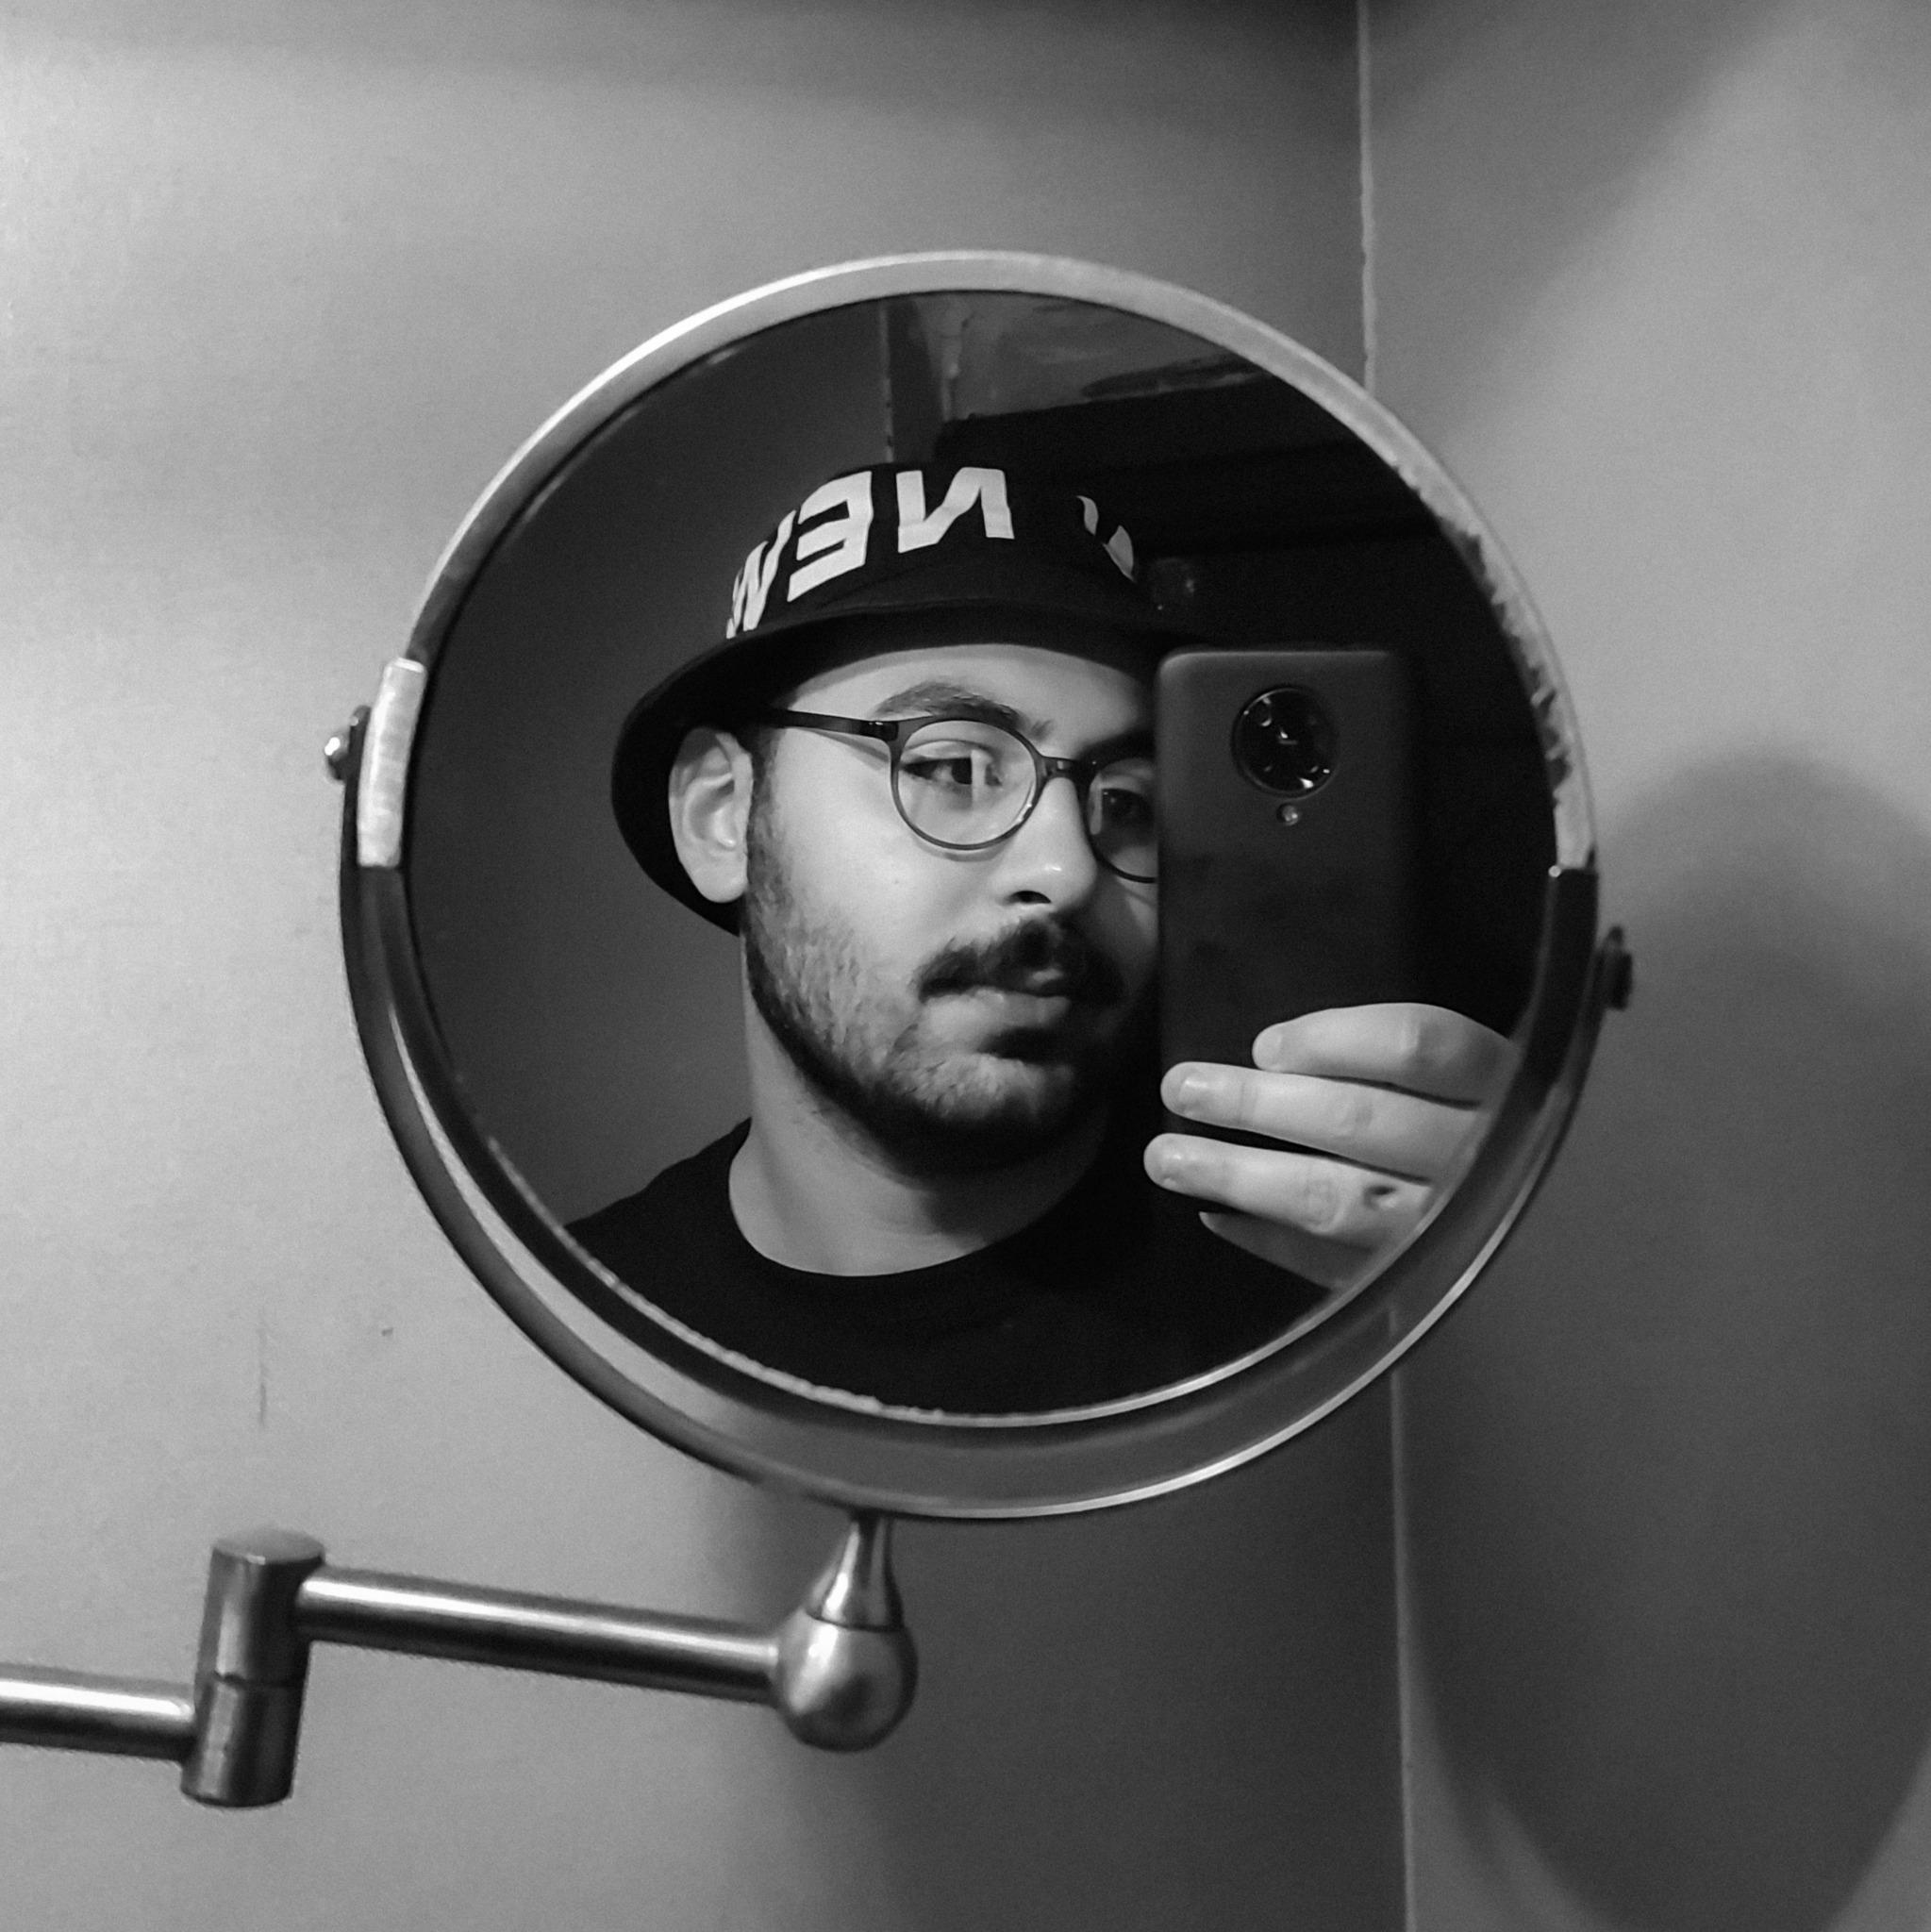 Farshad Jaberzade